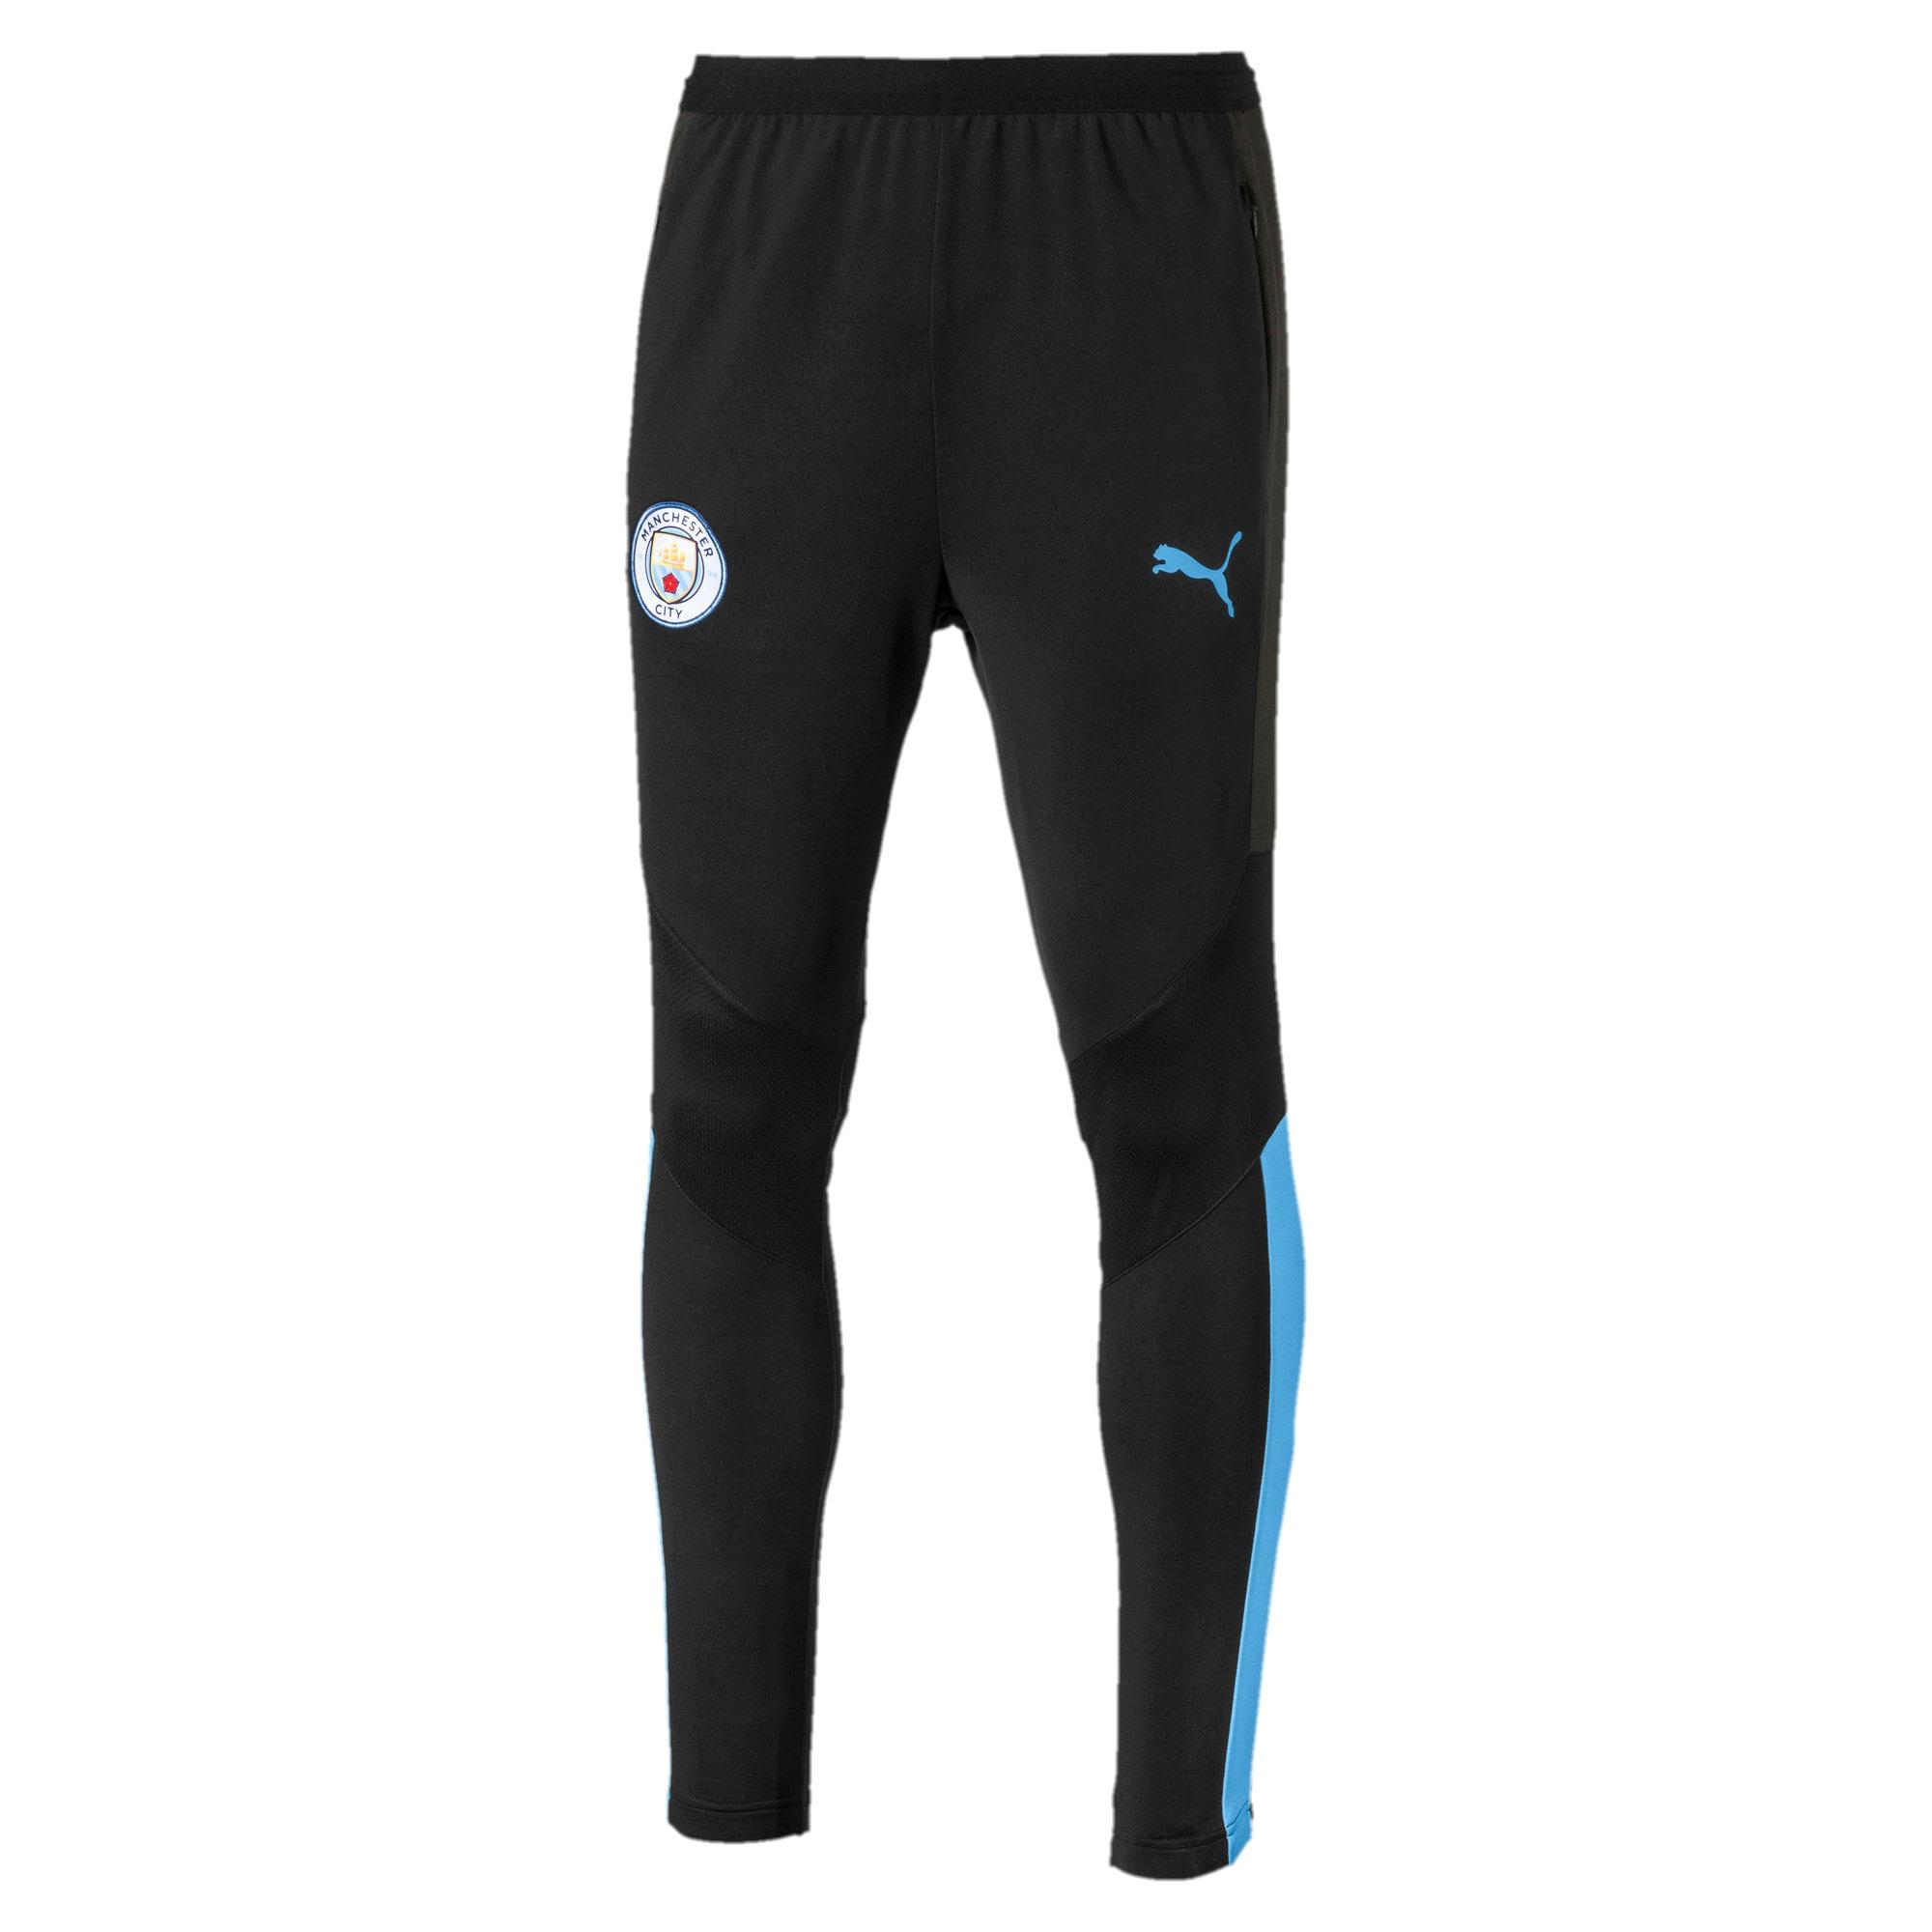 Thumbnail 1 of Manchester City FC Men's Pro Training Pants, Puma Black-Team Light Blue, medium